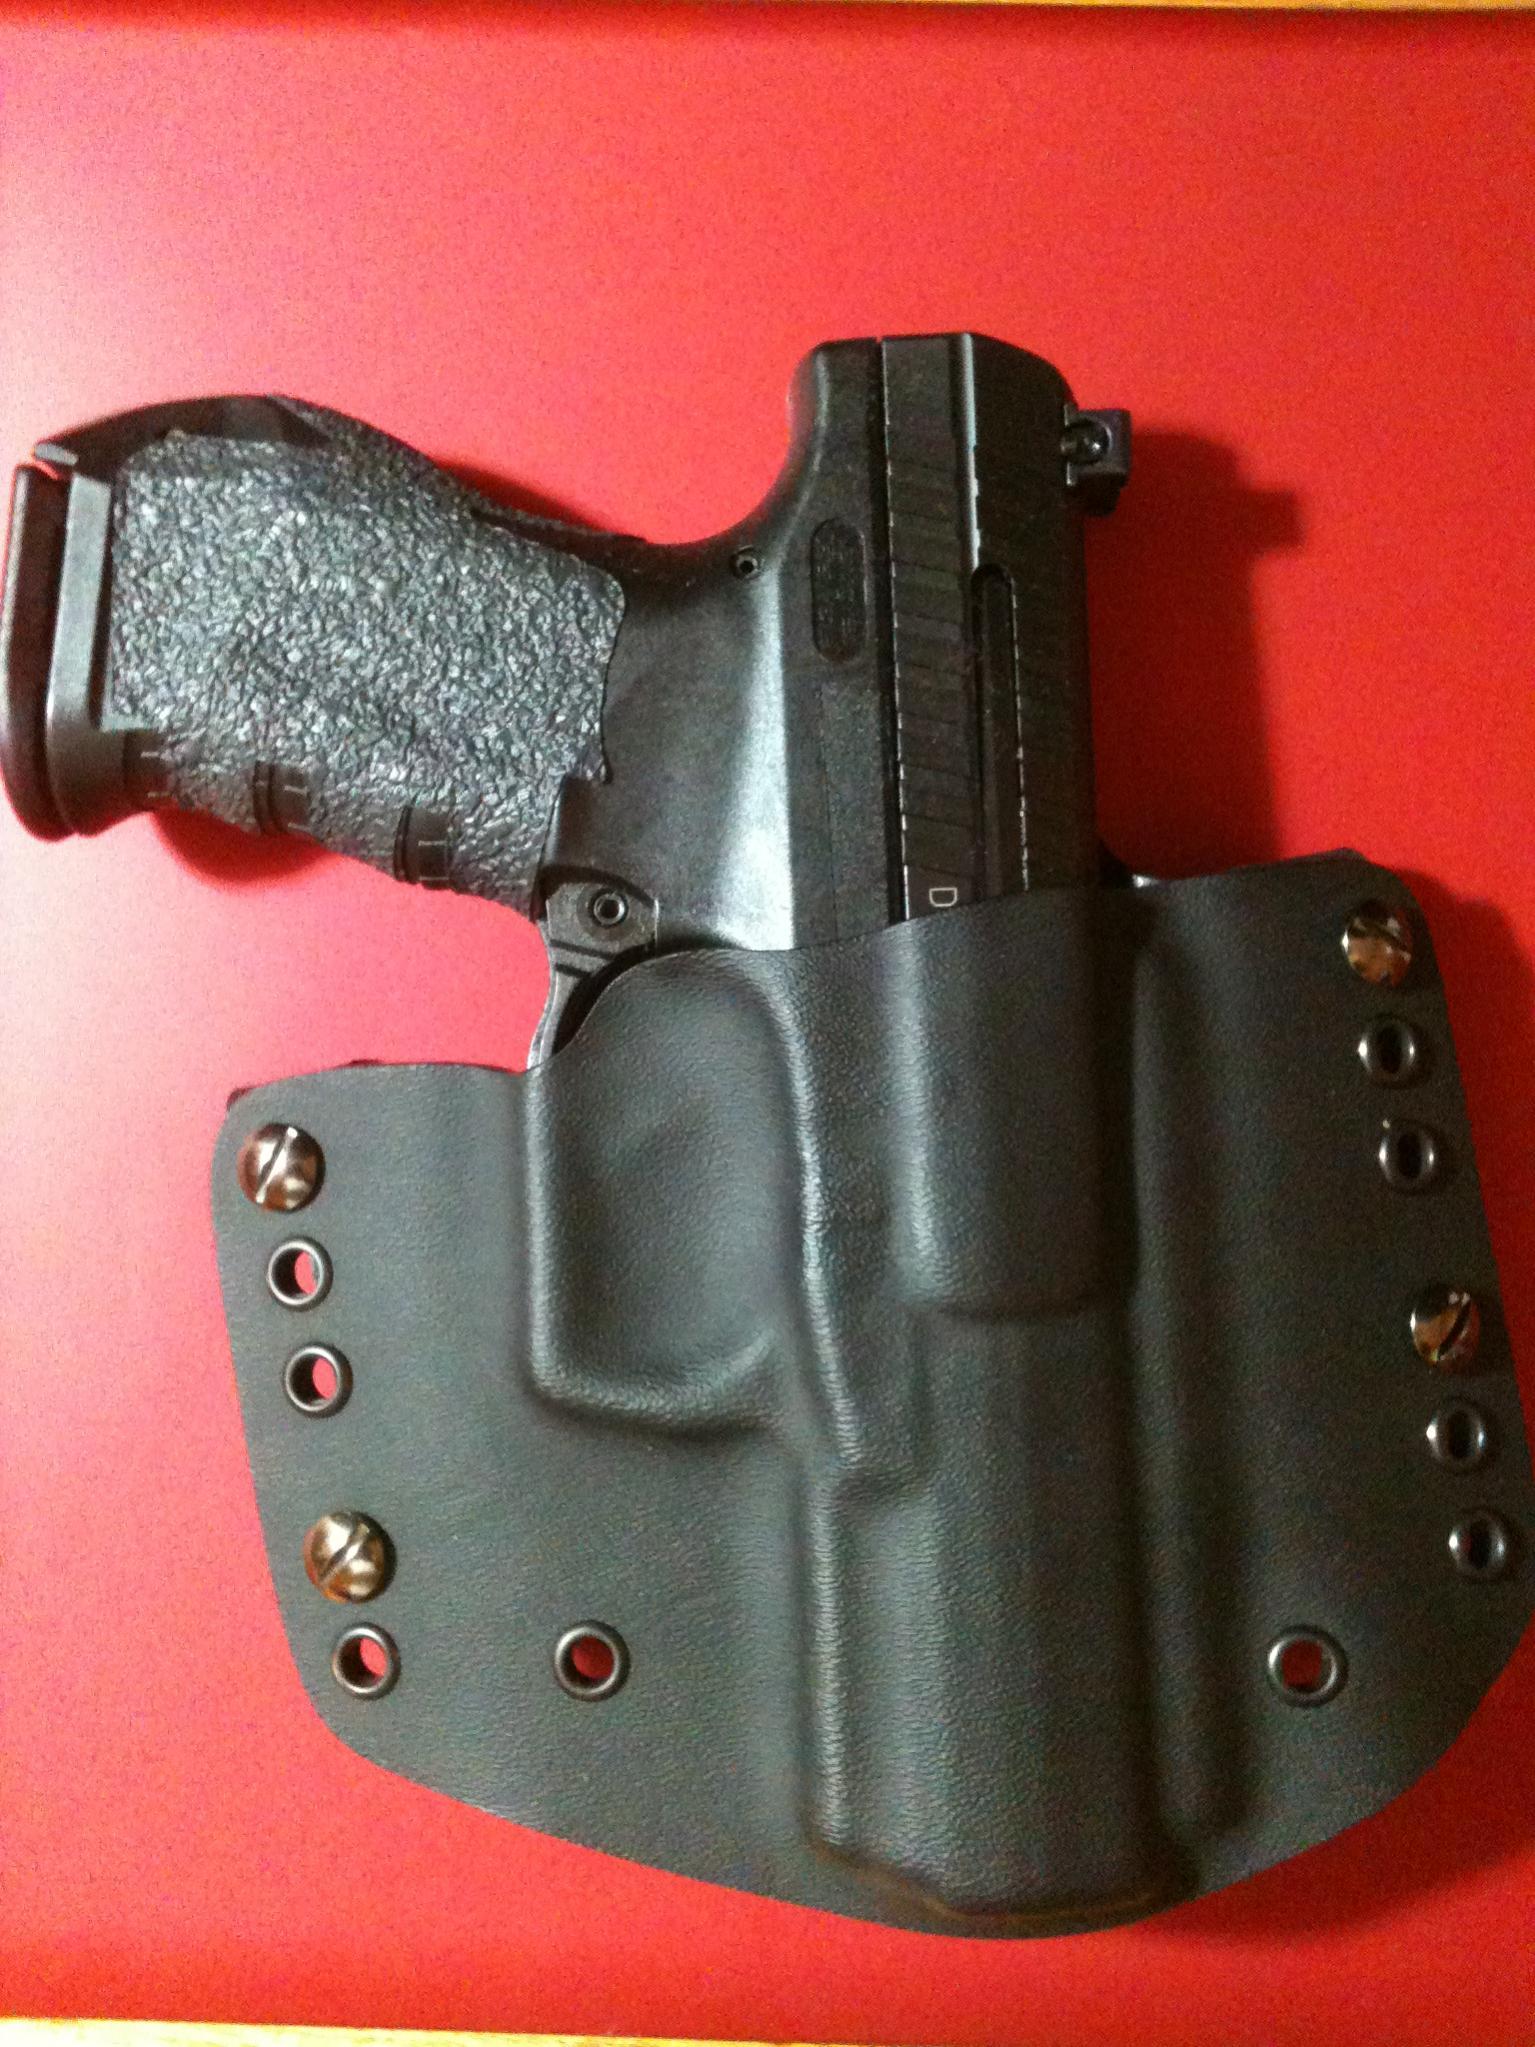 Midworld gun leather is GTG,,,,,kydex too....-new-holster.jpg